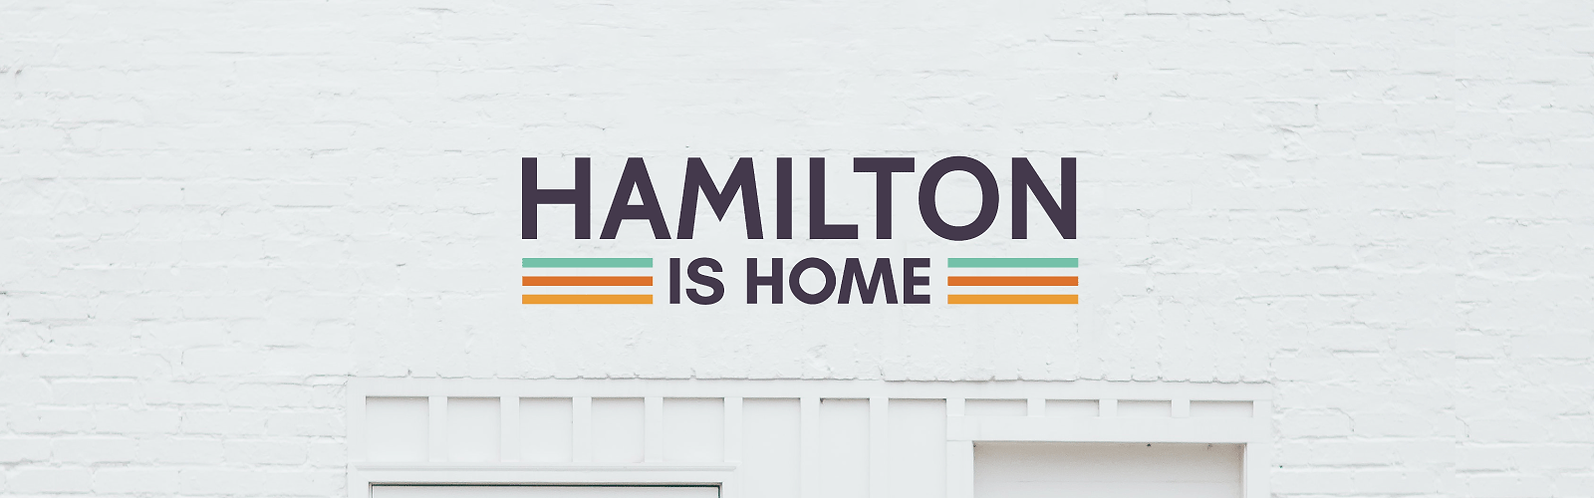 hamilton is home brand identity